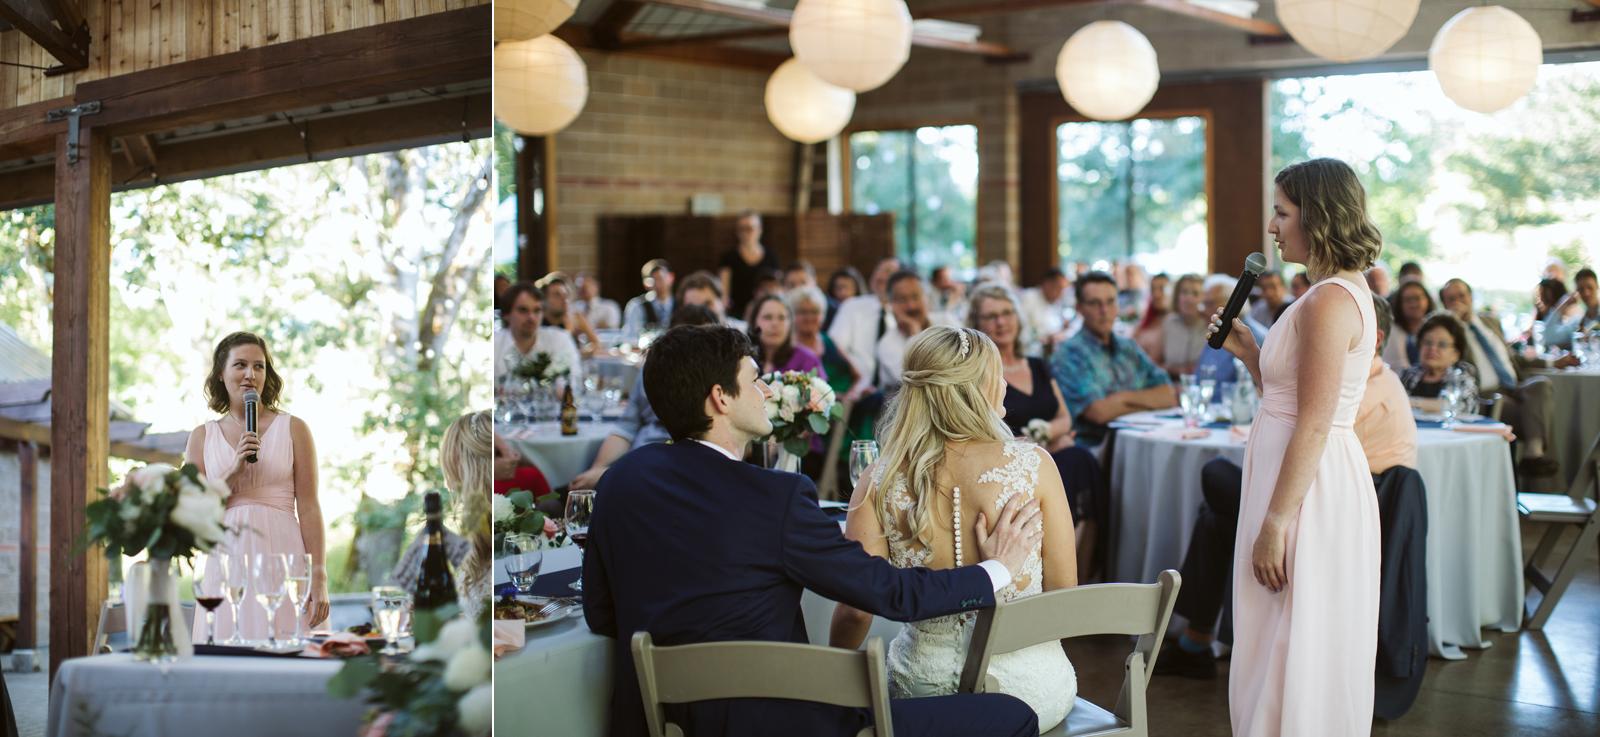 101-daronjackson-rachel-michael-wedding-mtpisgah.jpg